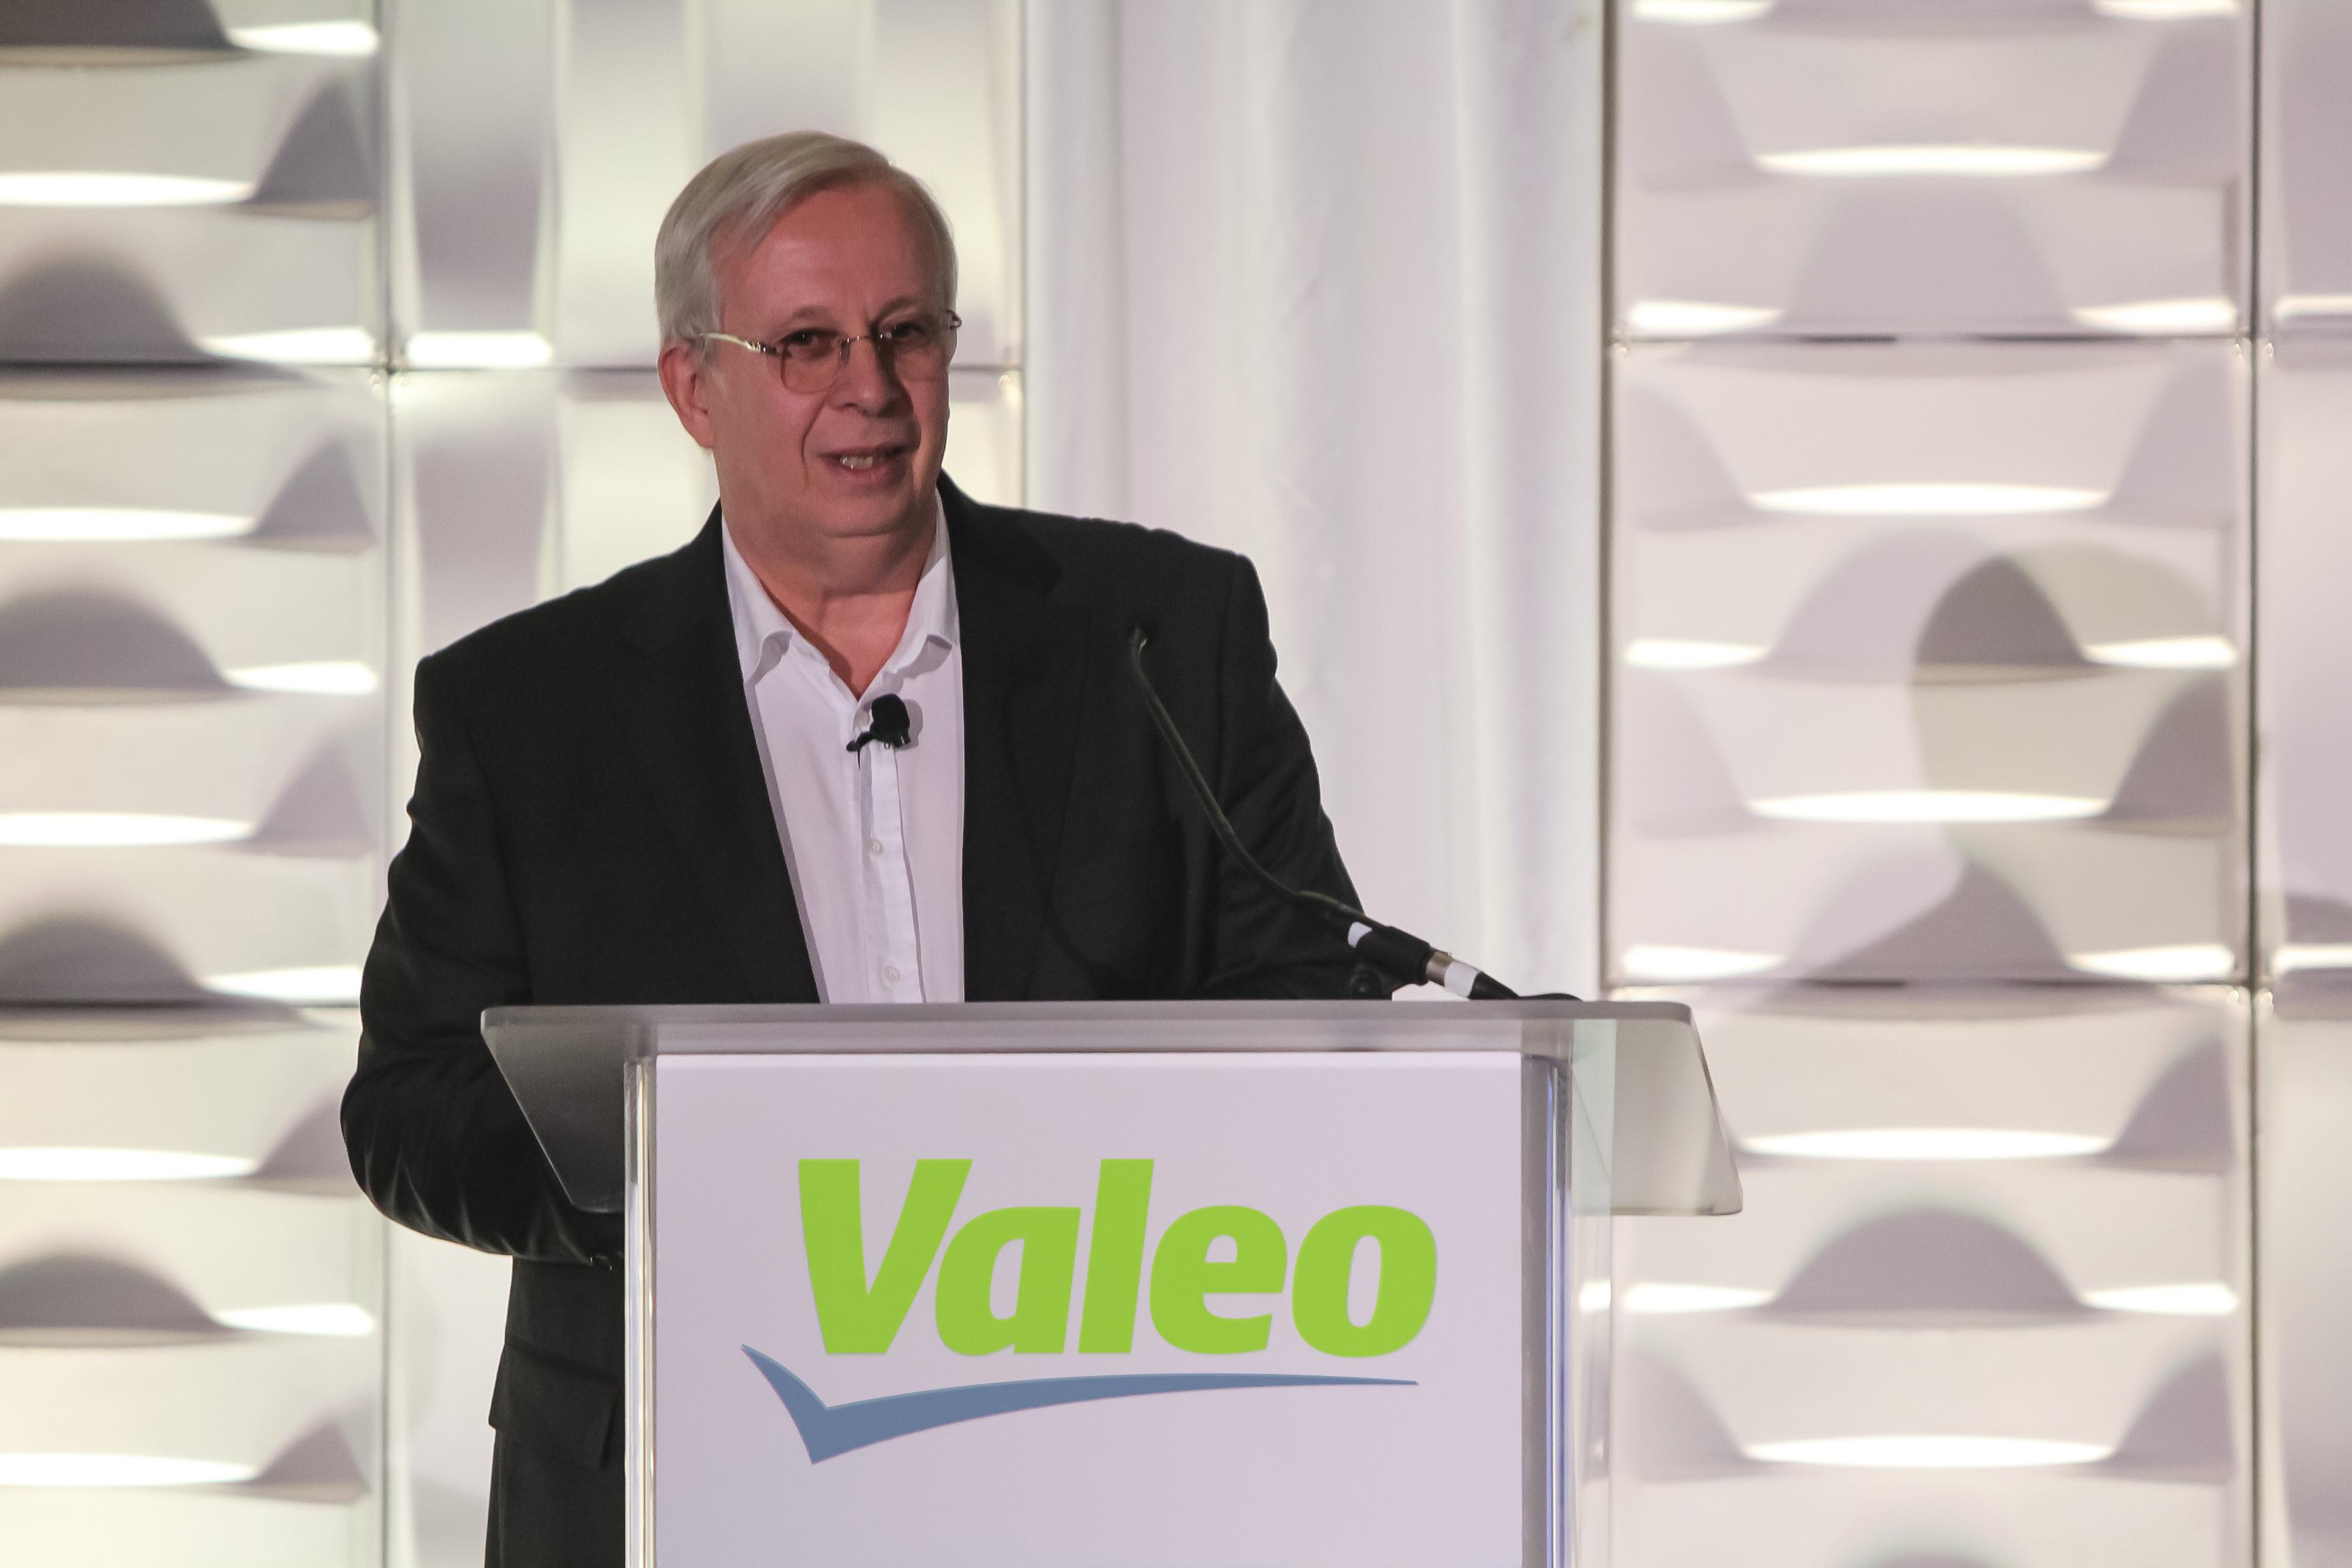 Valeo CEO Jacques Aschenbroich giving a speech at CES 2018